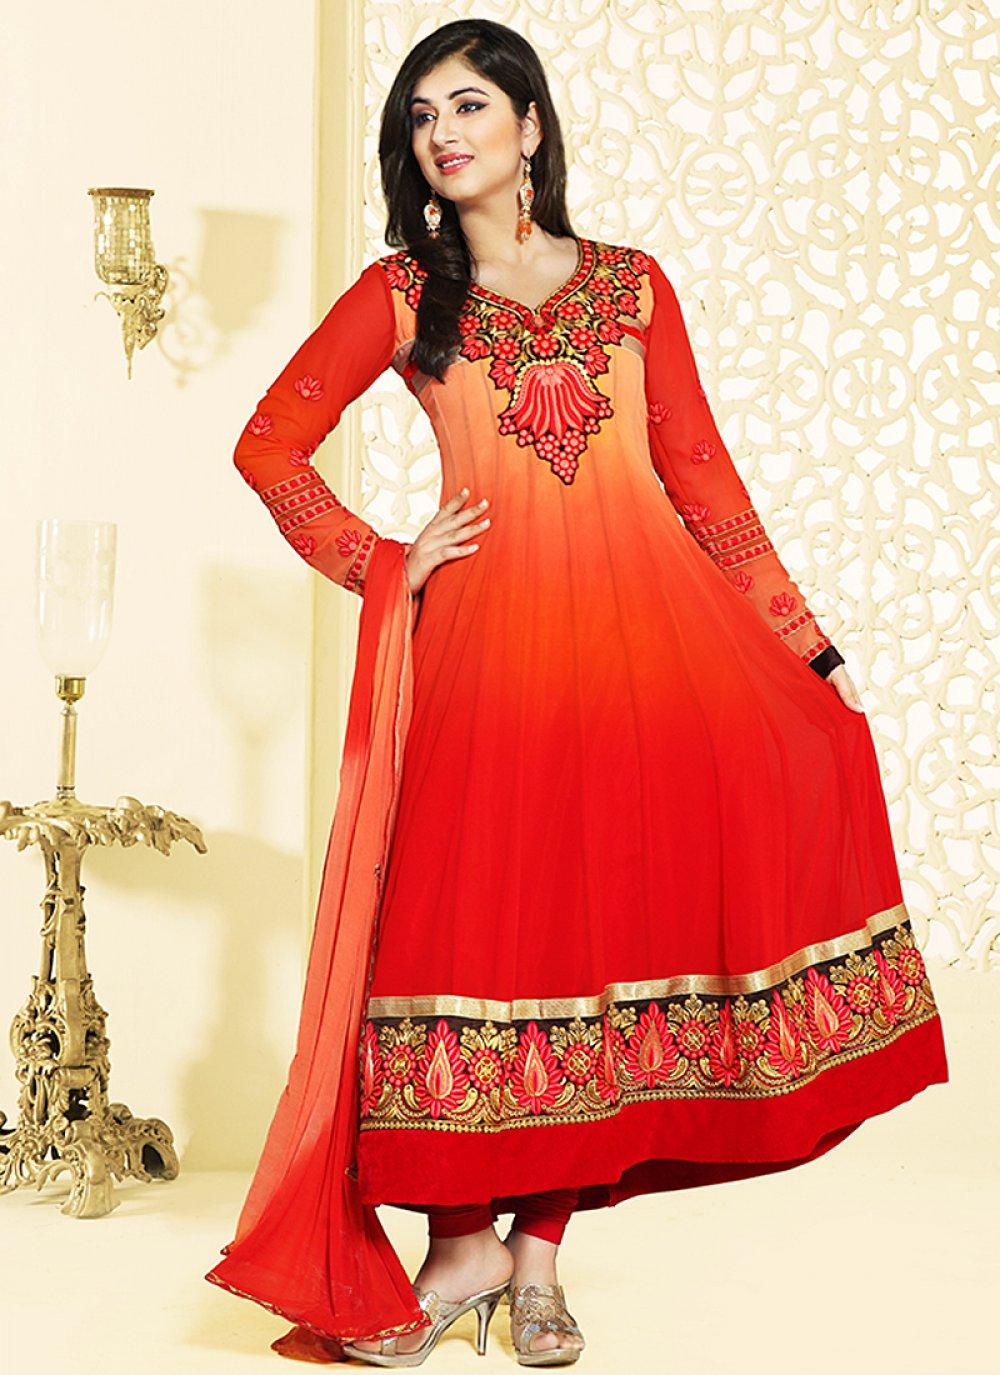 Red And Orange Zari Work Anarkali Salwar Kameez